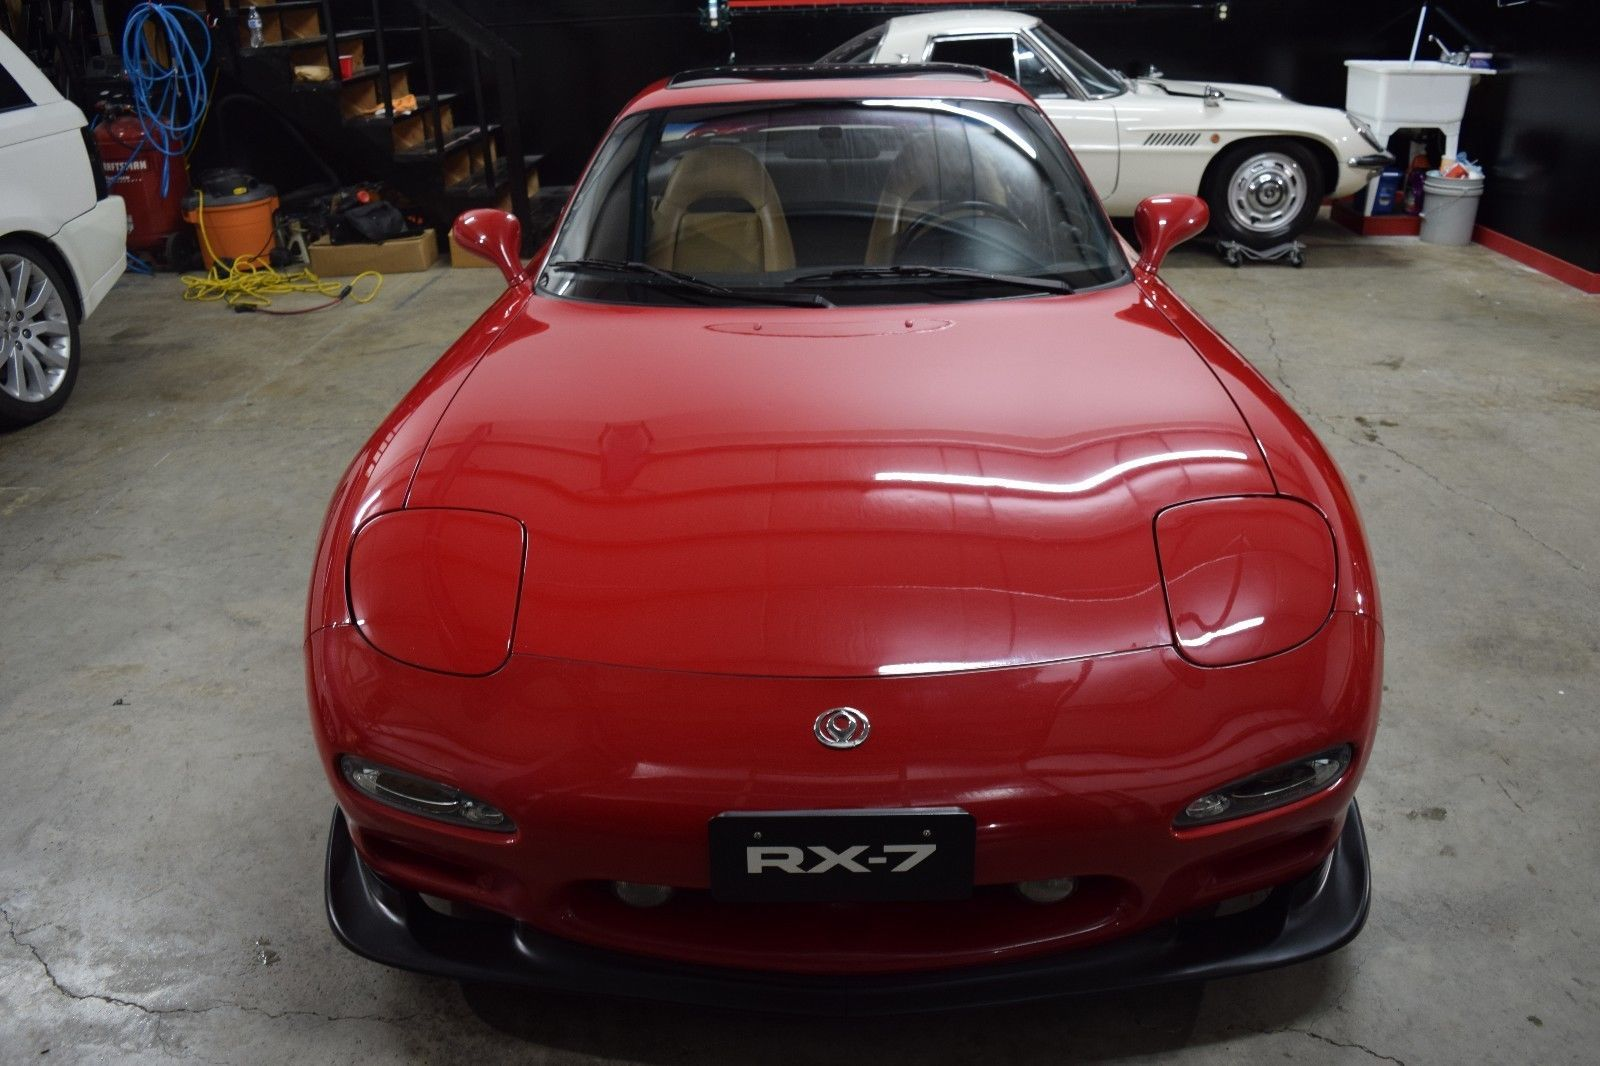 eBay: 1994 Mazda RX-7 1994 MAZDA RX7 FD rotary clic rare not a ...